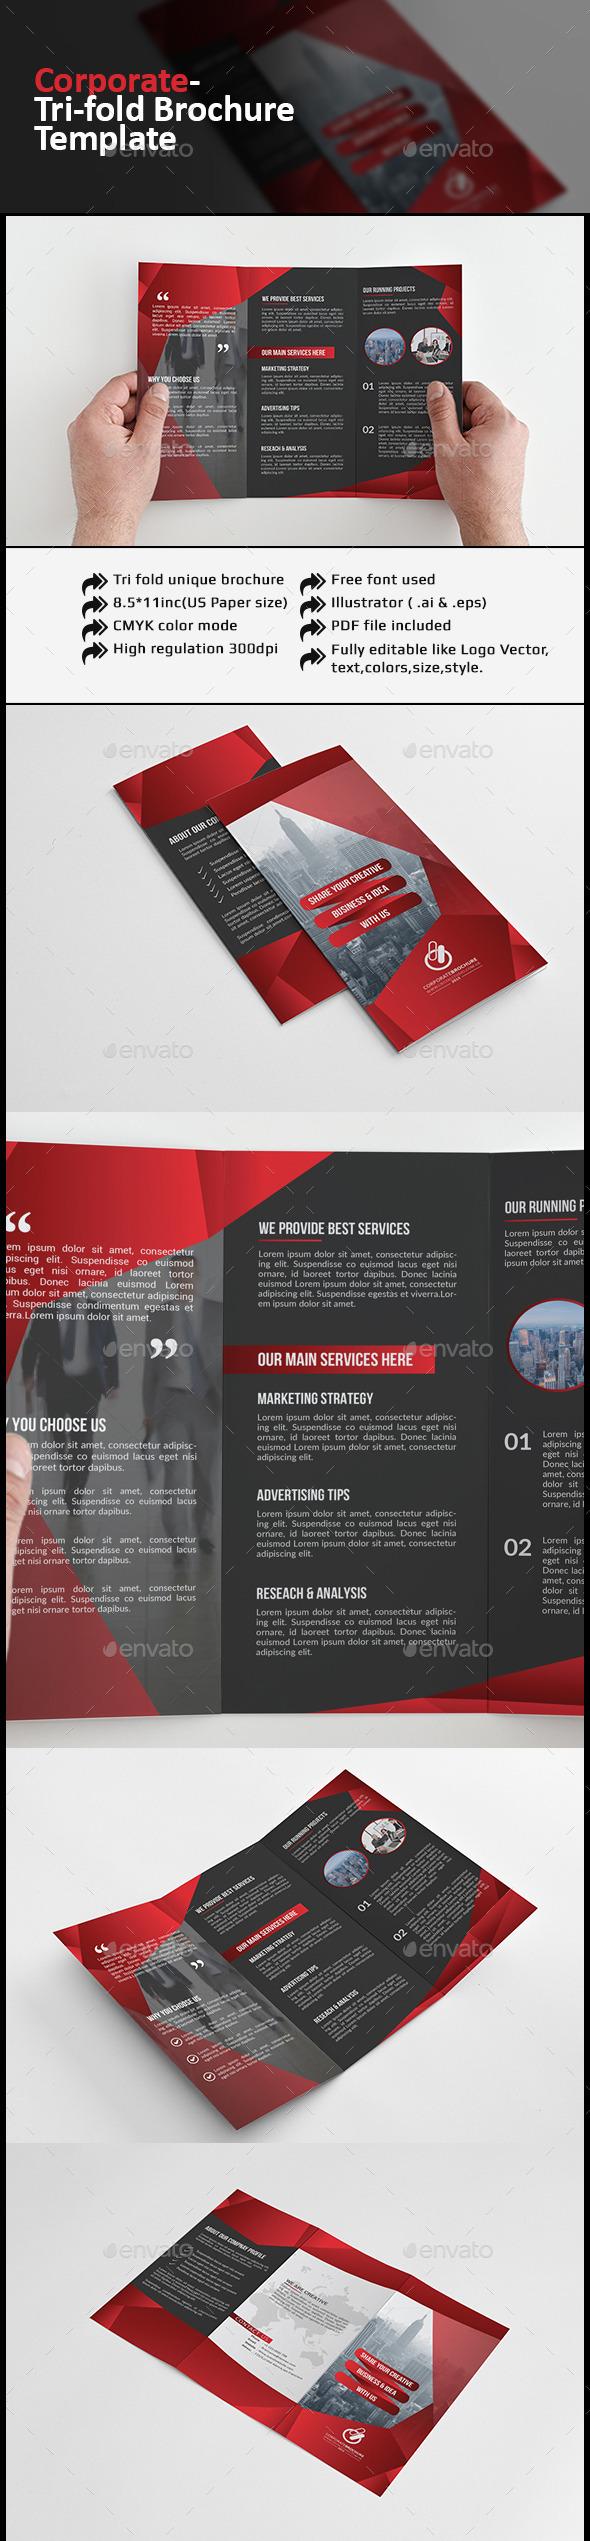 Red Corporate Tri-fold Brochure - Corporate Brochures